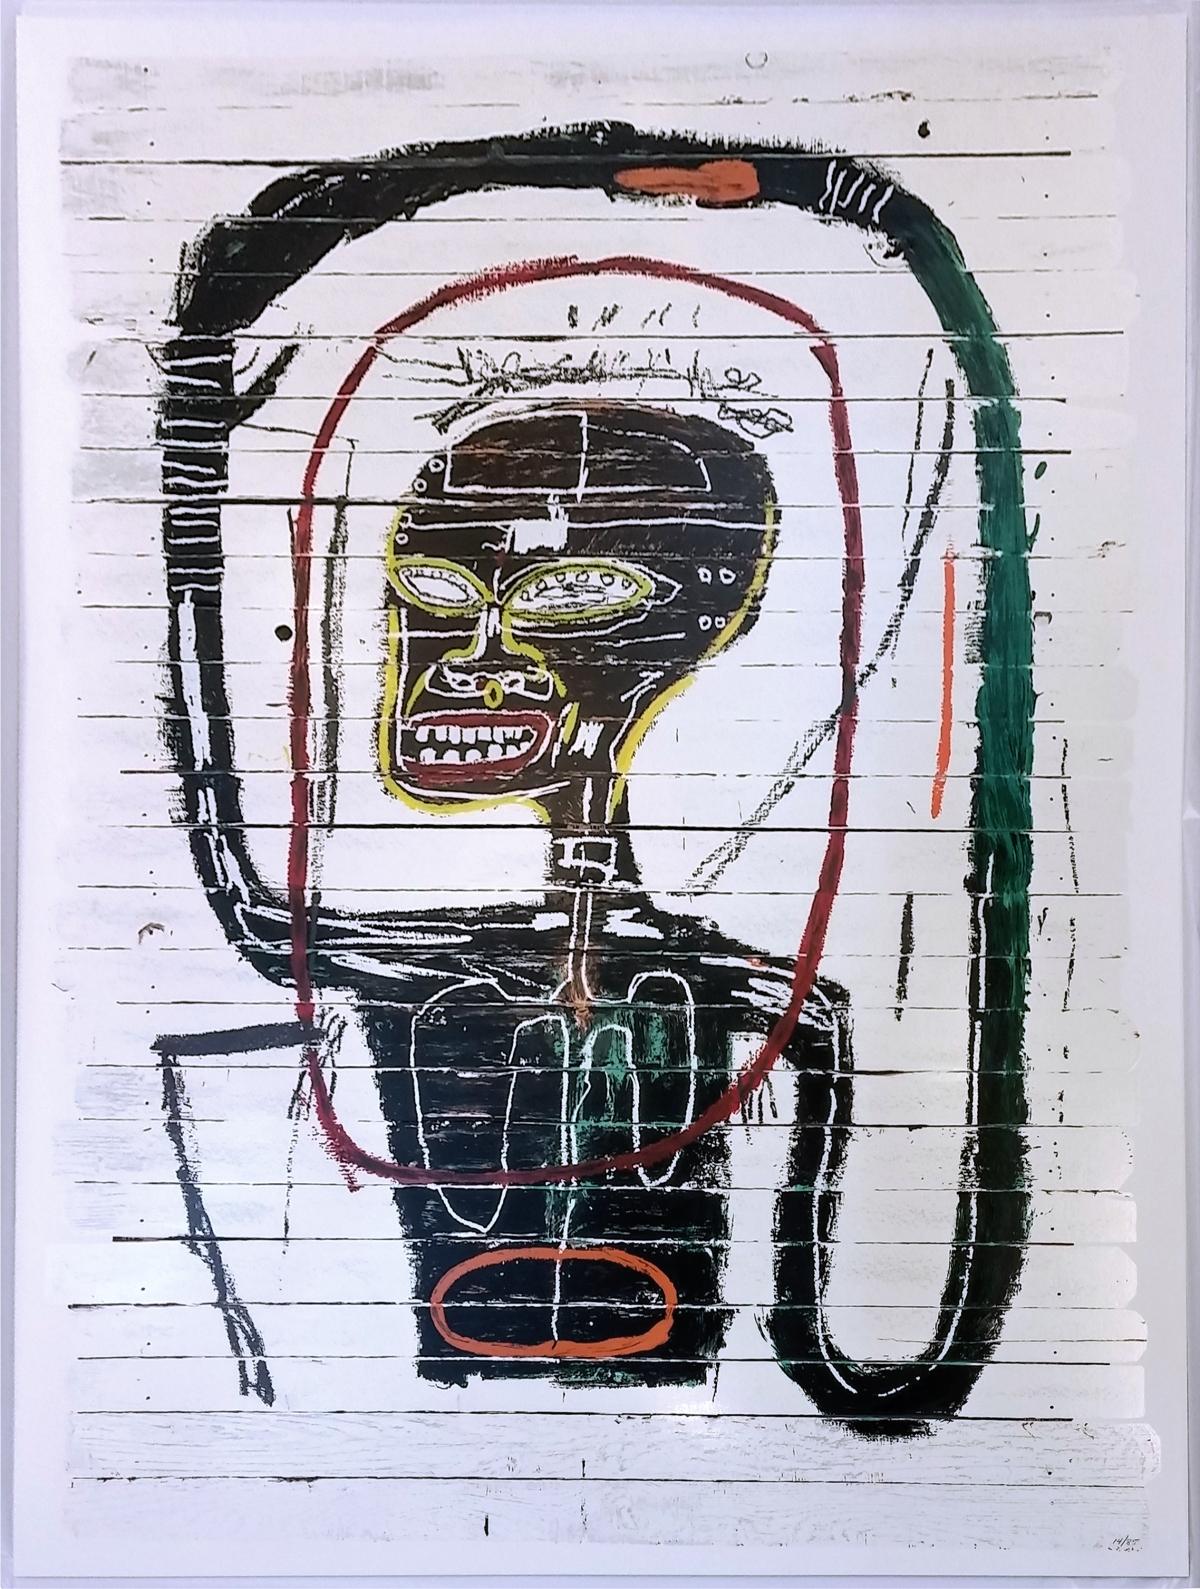 New Yorker Artist Jean-Michel Basquiat Joins the 100 MillionClub